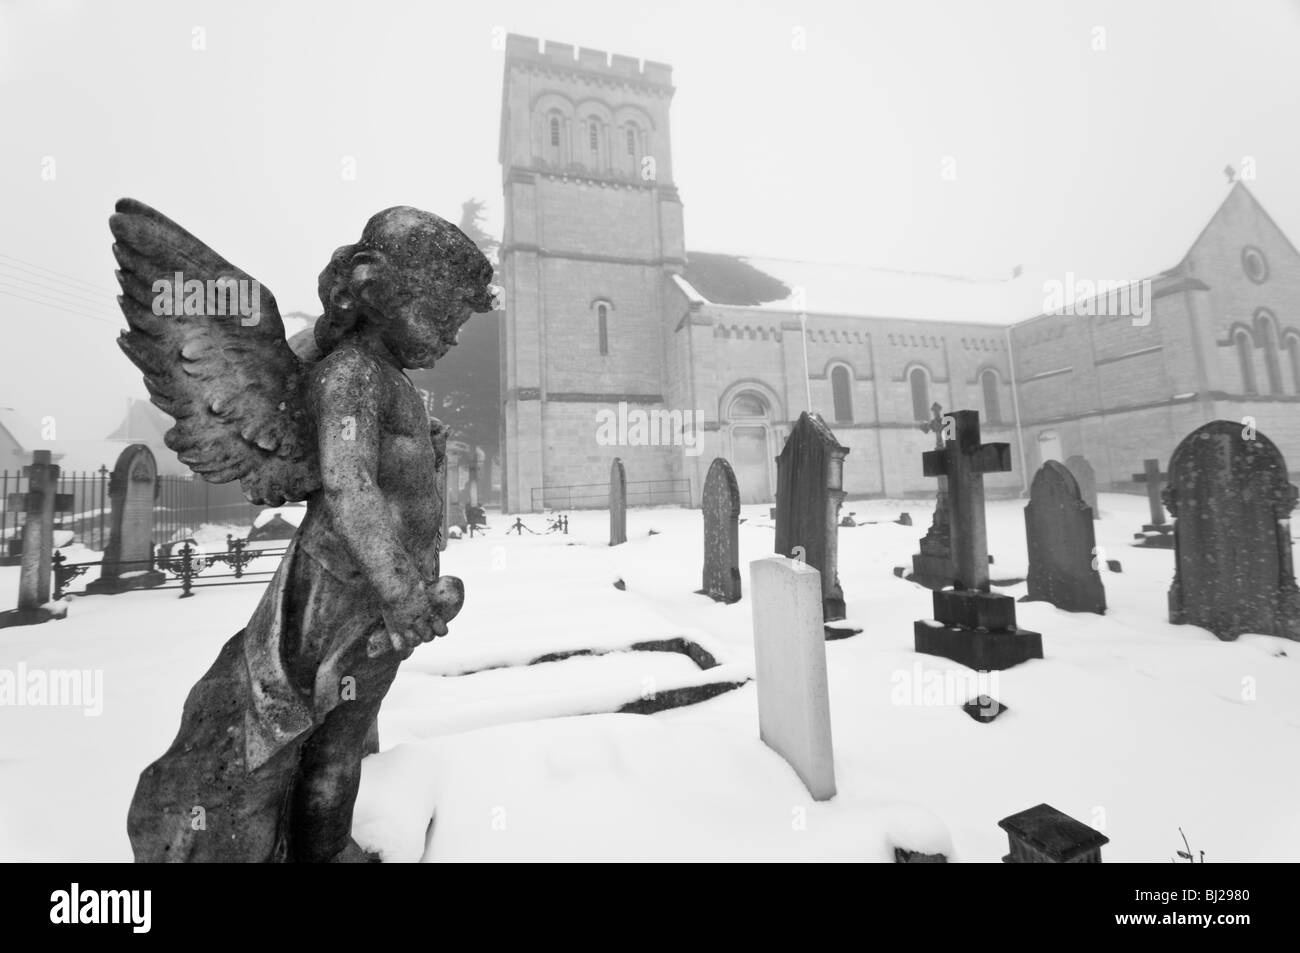 Statue of Angel, Churchyard, St Pauls Church, Whiteshill, Stroud, Gloucestershire, UK - Stock Image